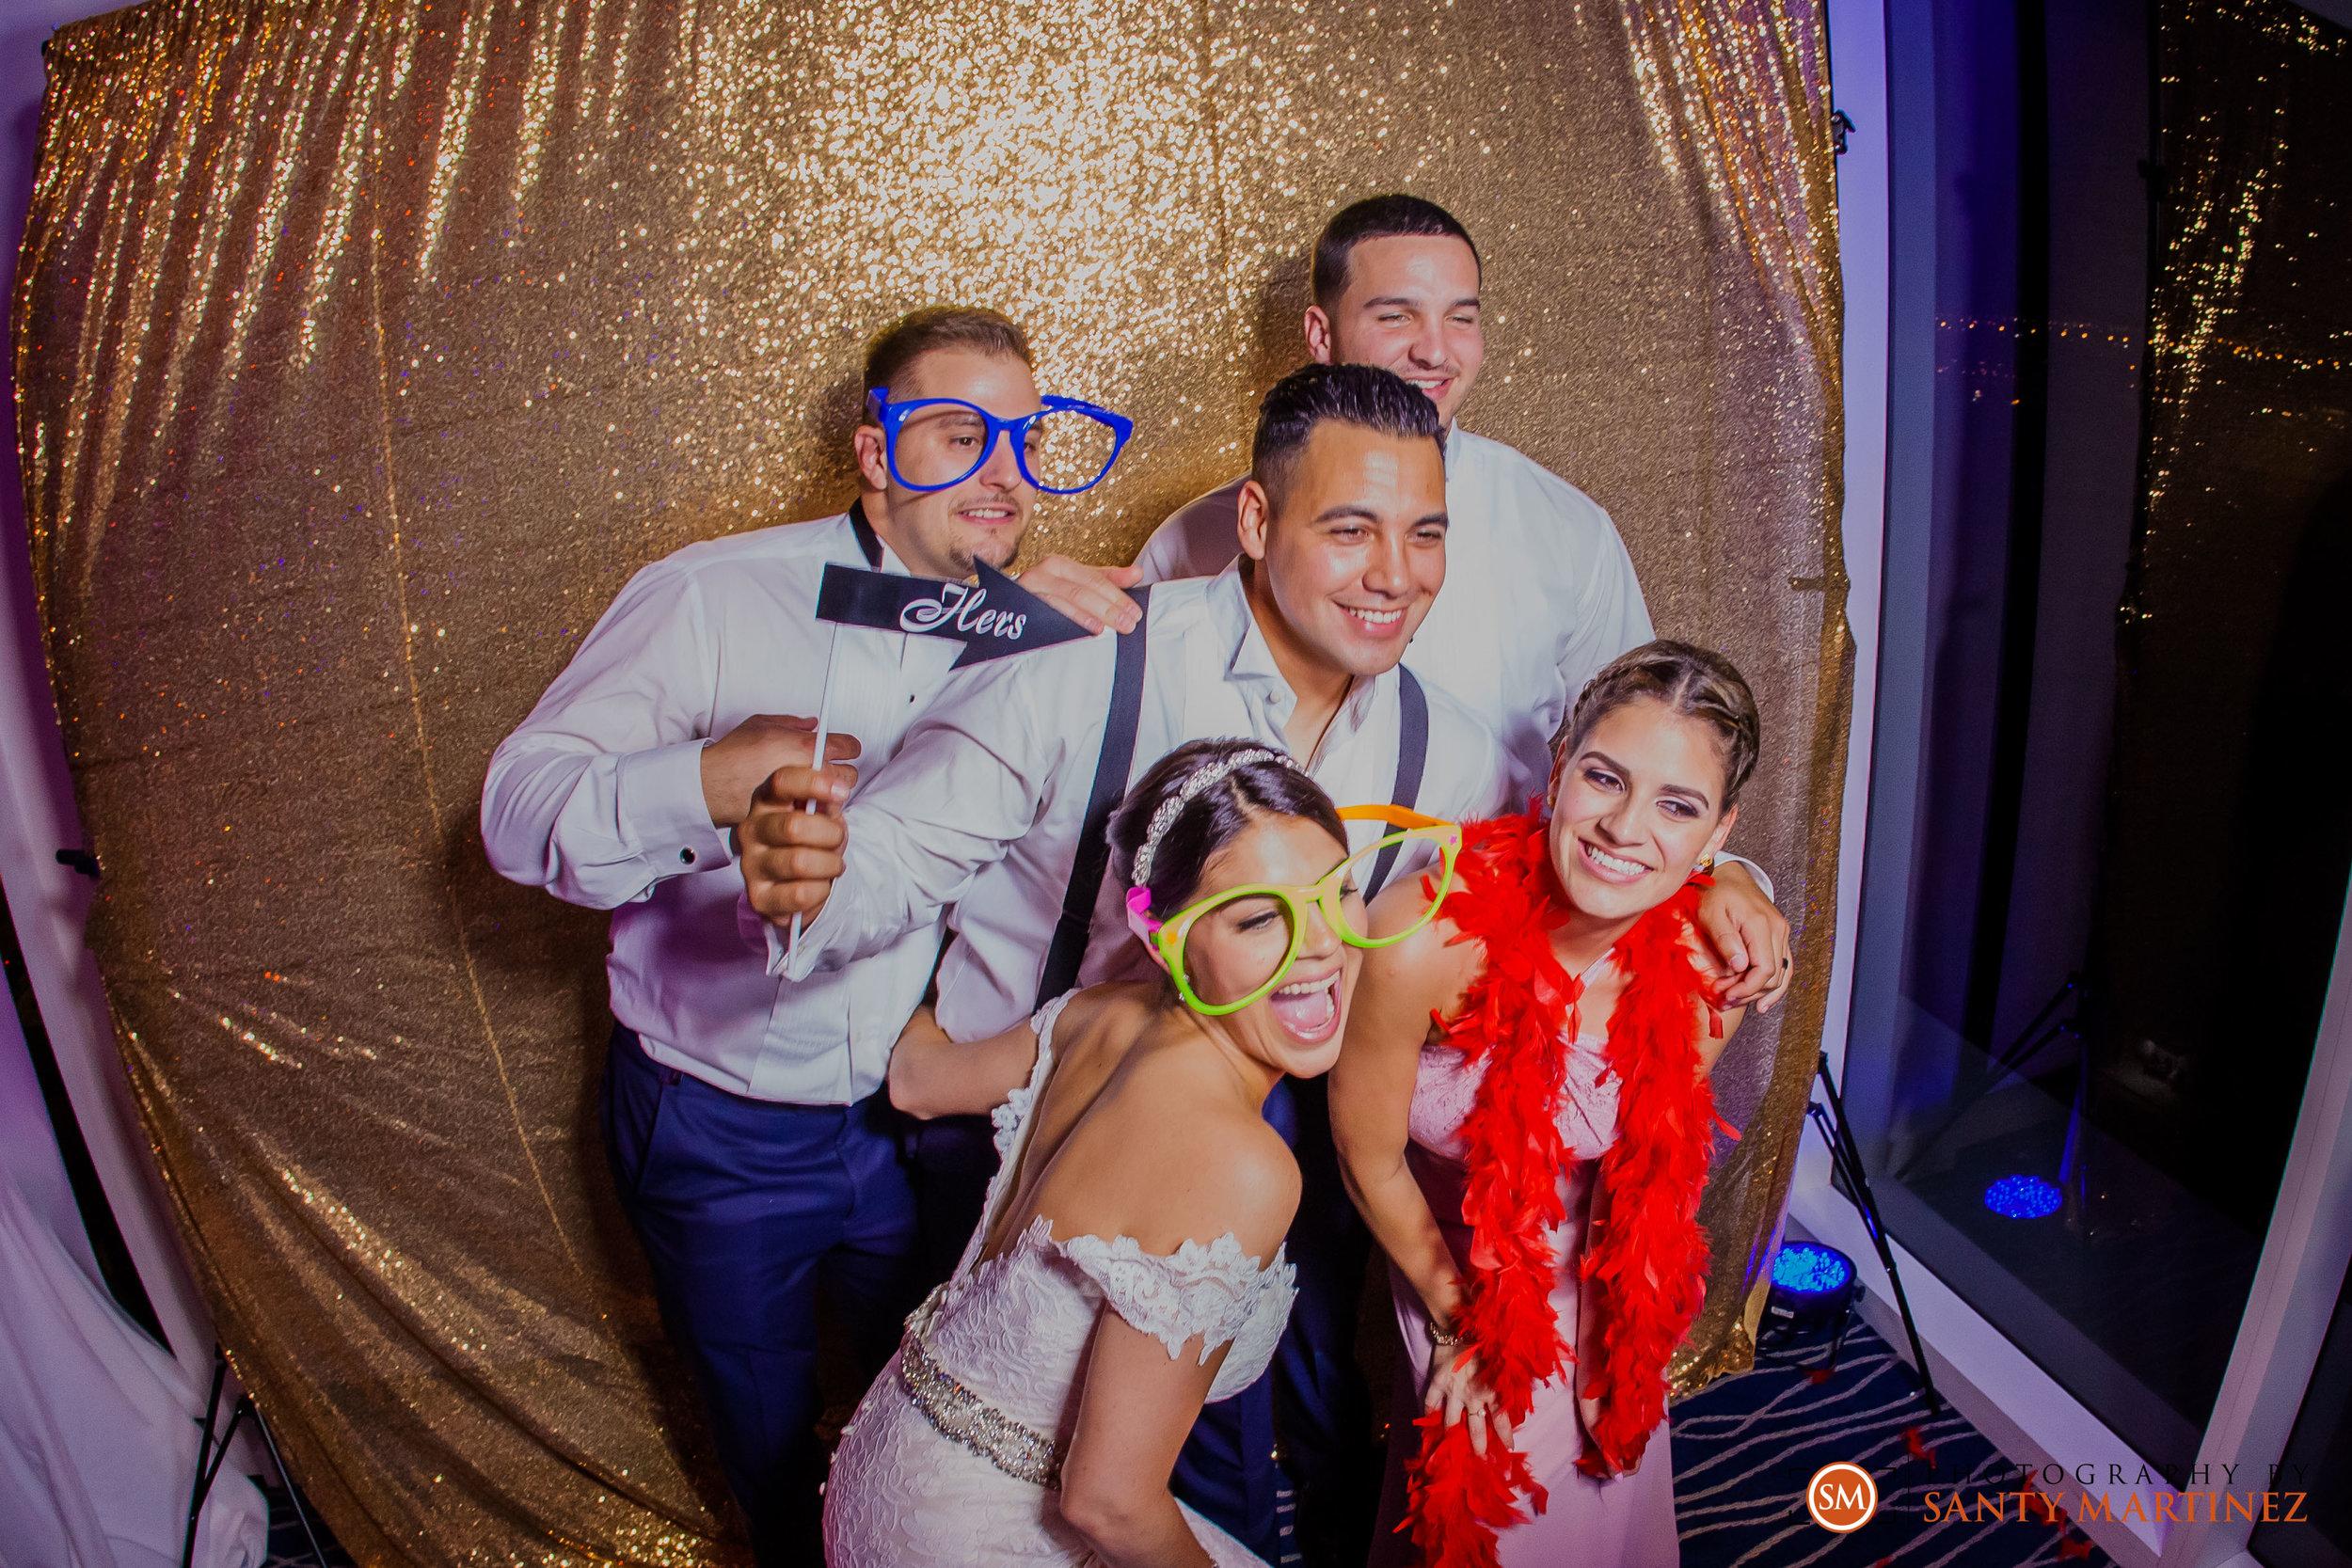 Miami Wedding Photographer - Santy Martinez-39.jpg